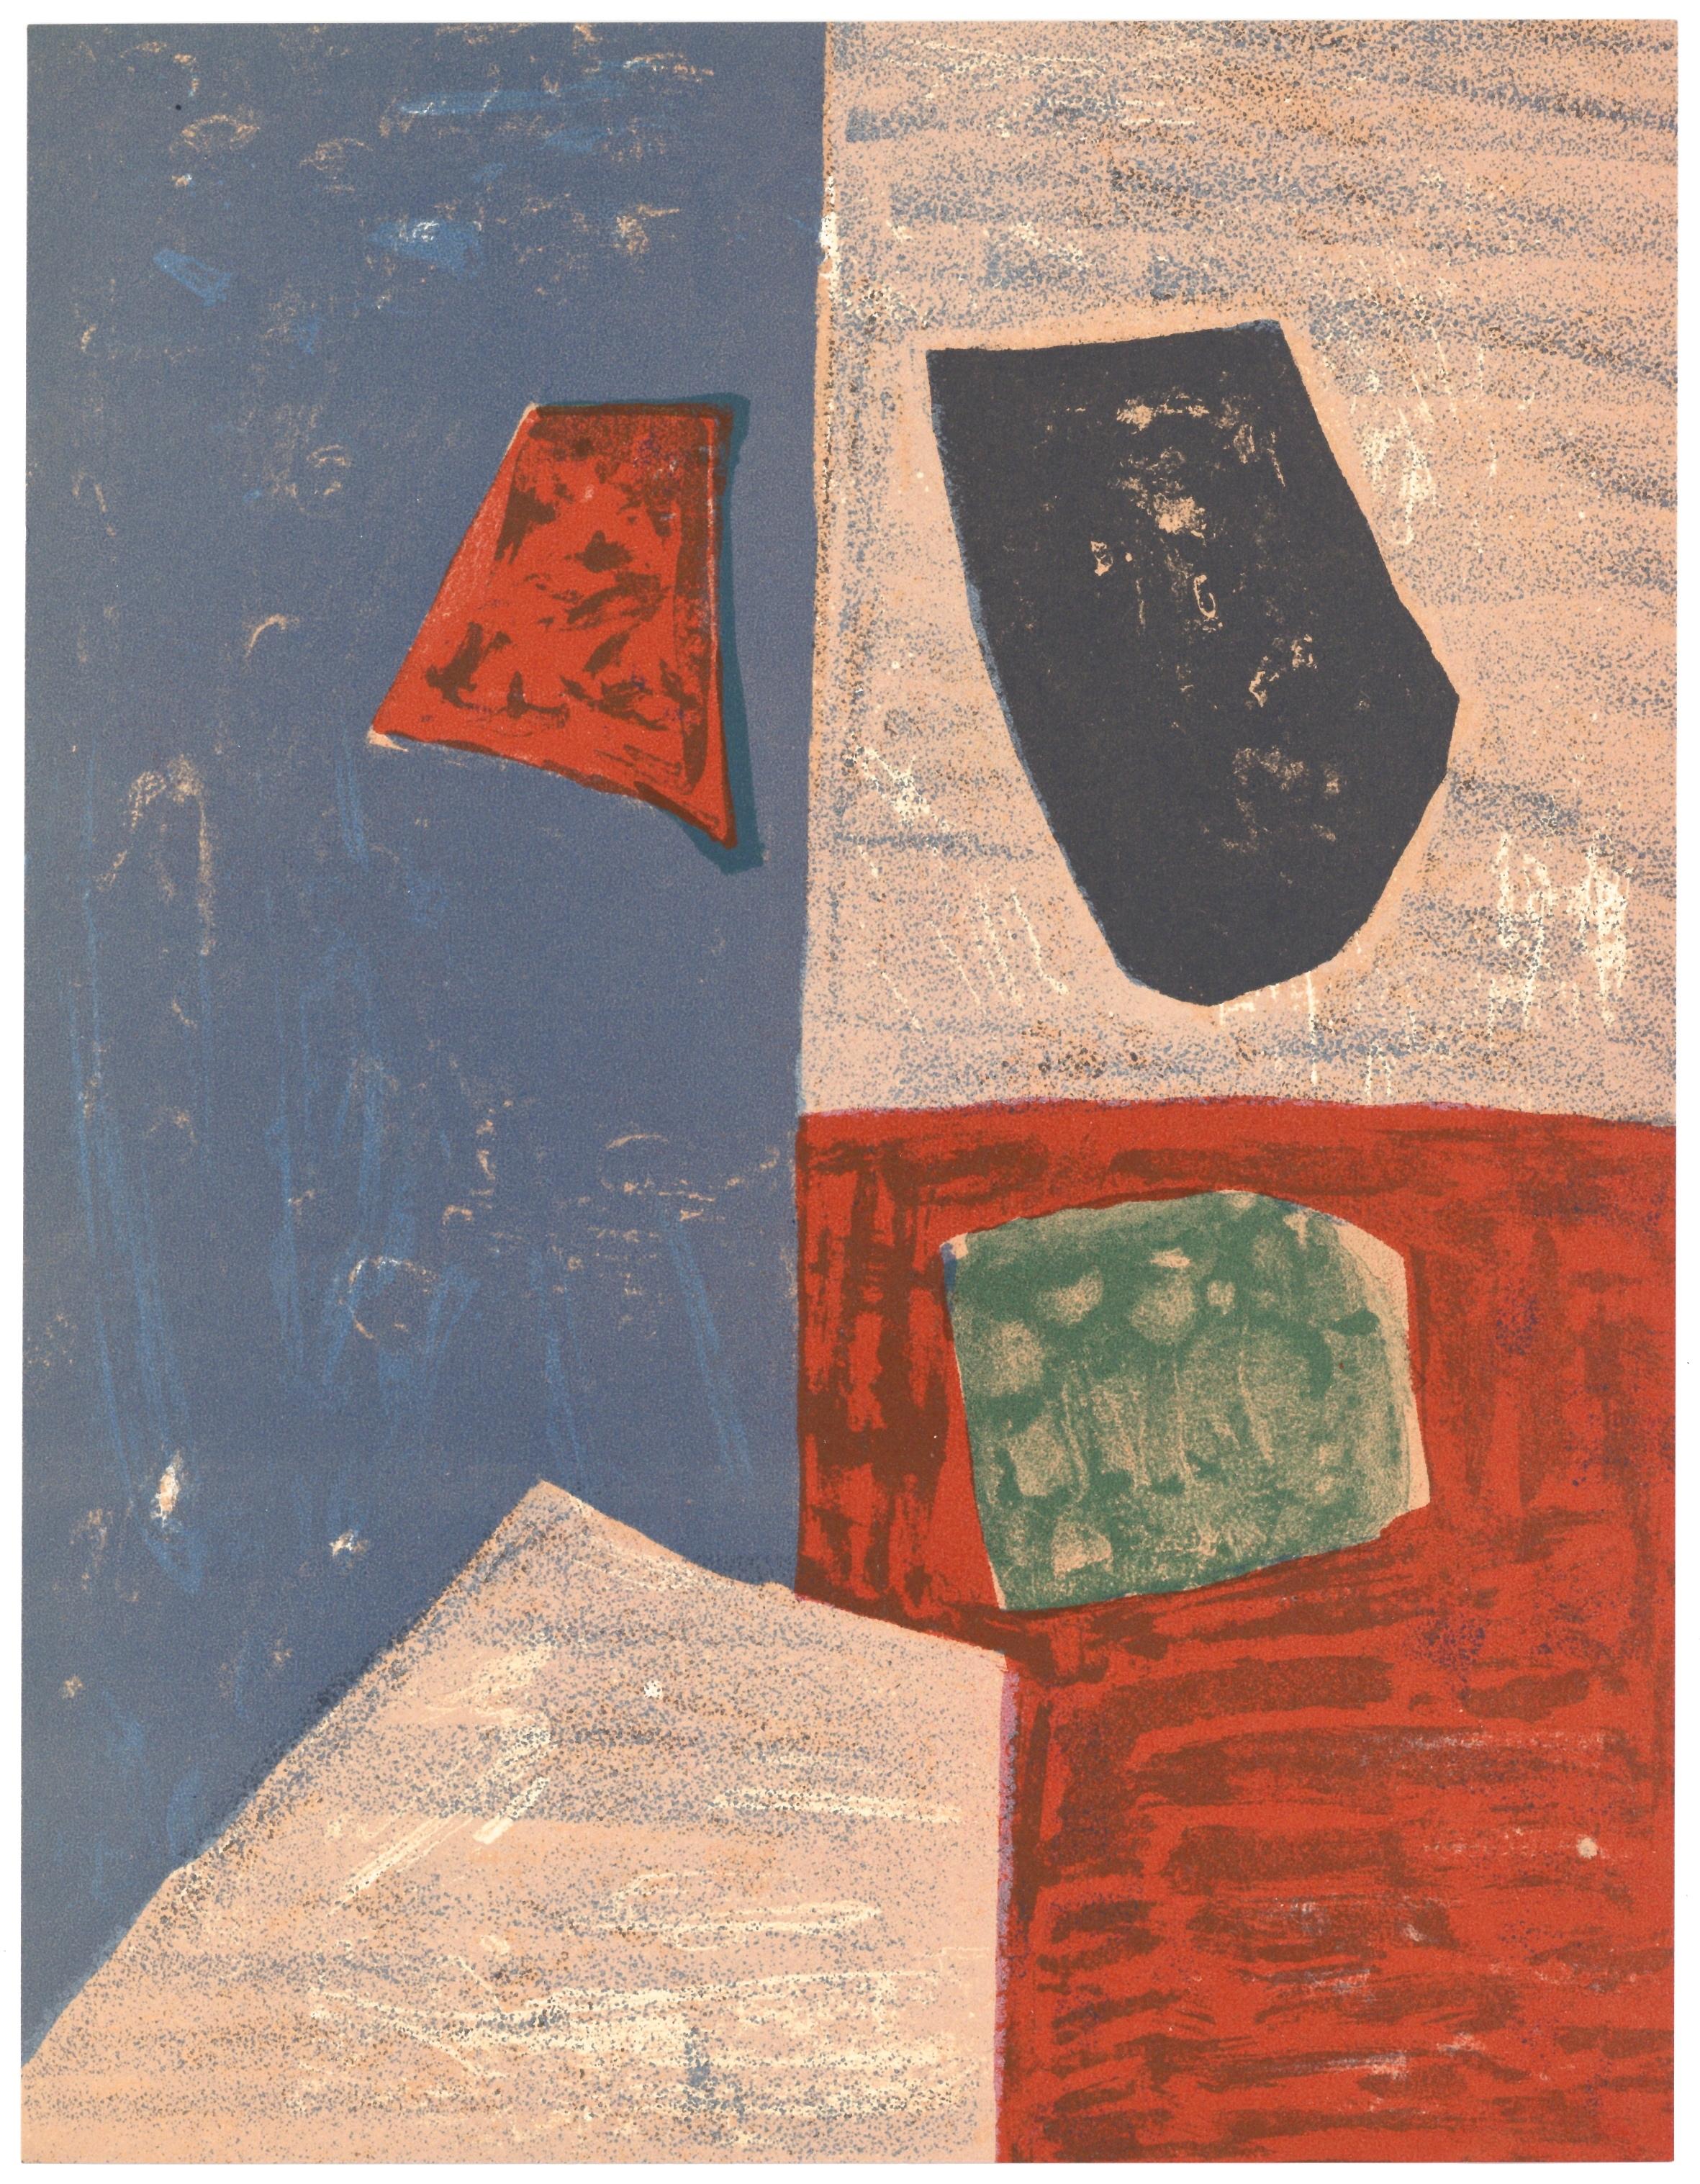 41ea45ba3bd Serge Poliakoff original lithograph